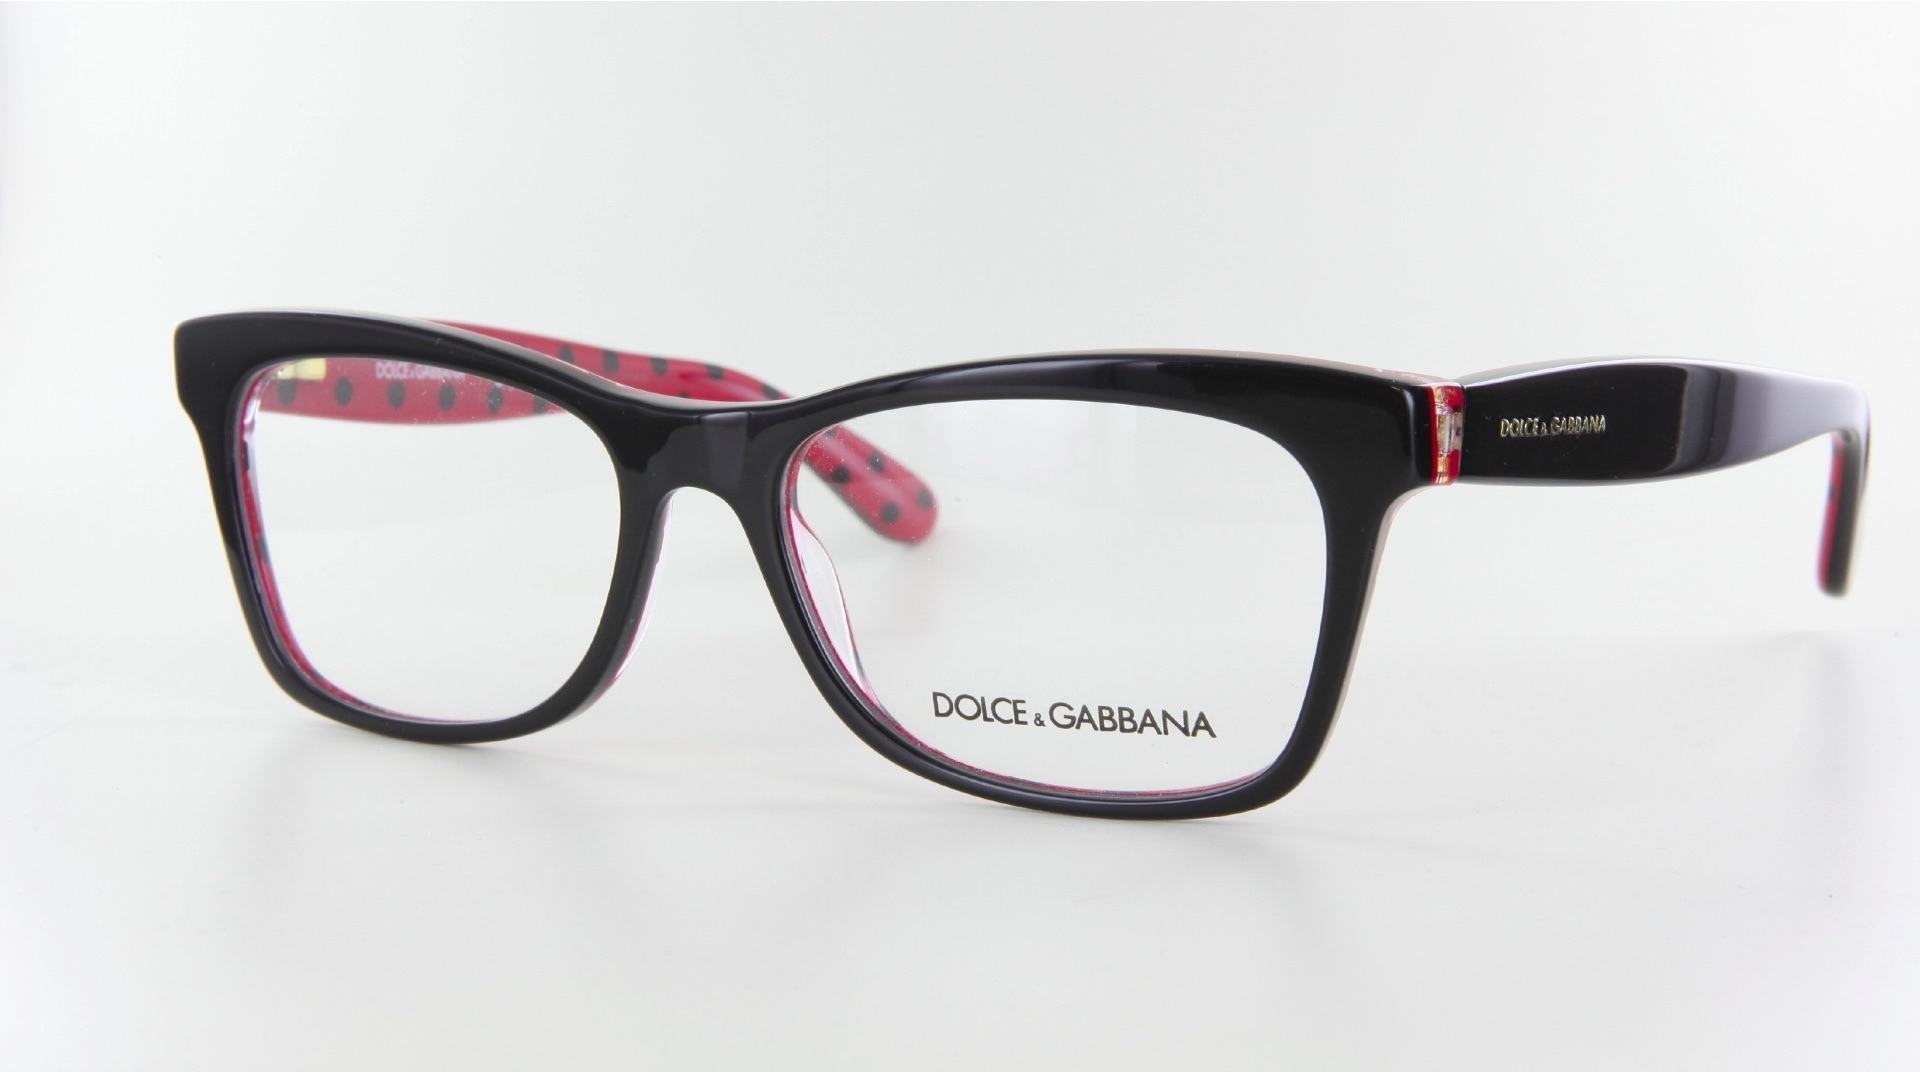 Dolce & Gabbana - ref: 72000